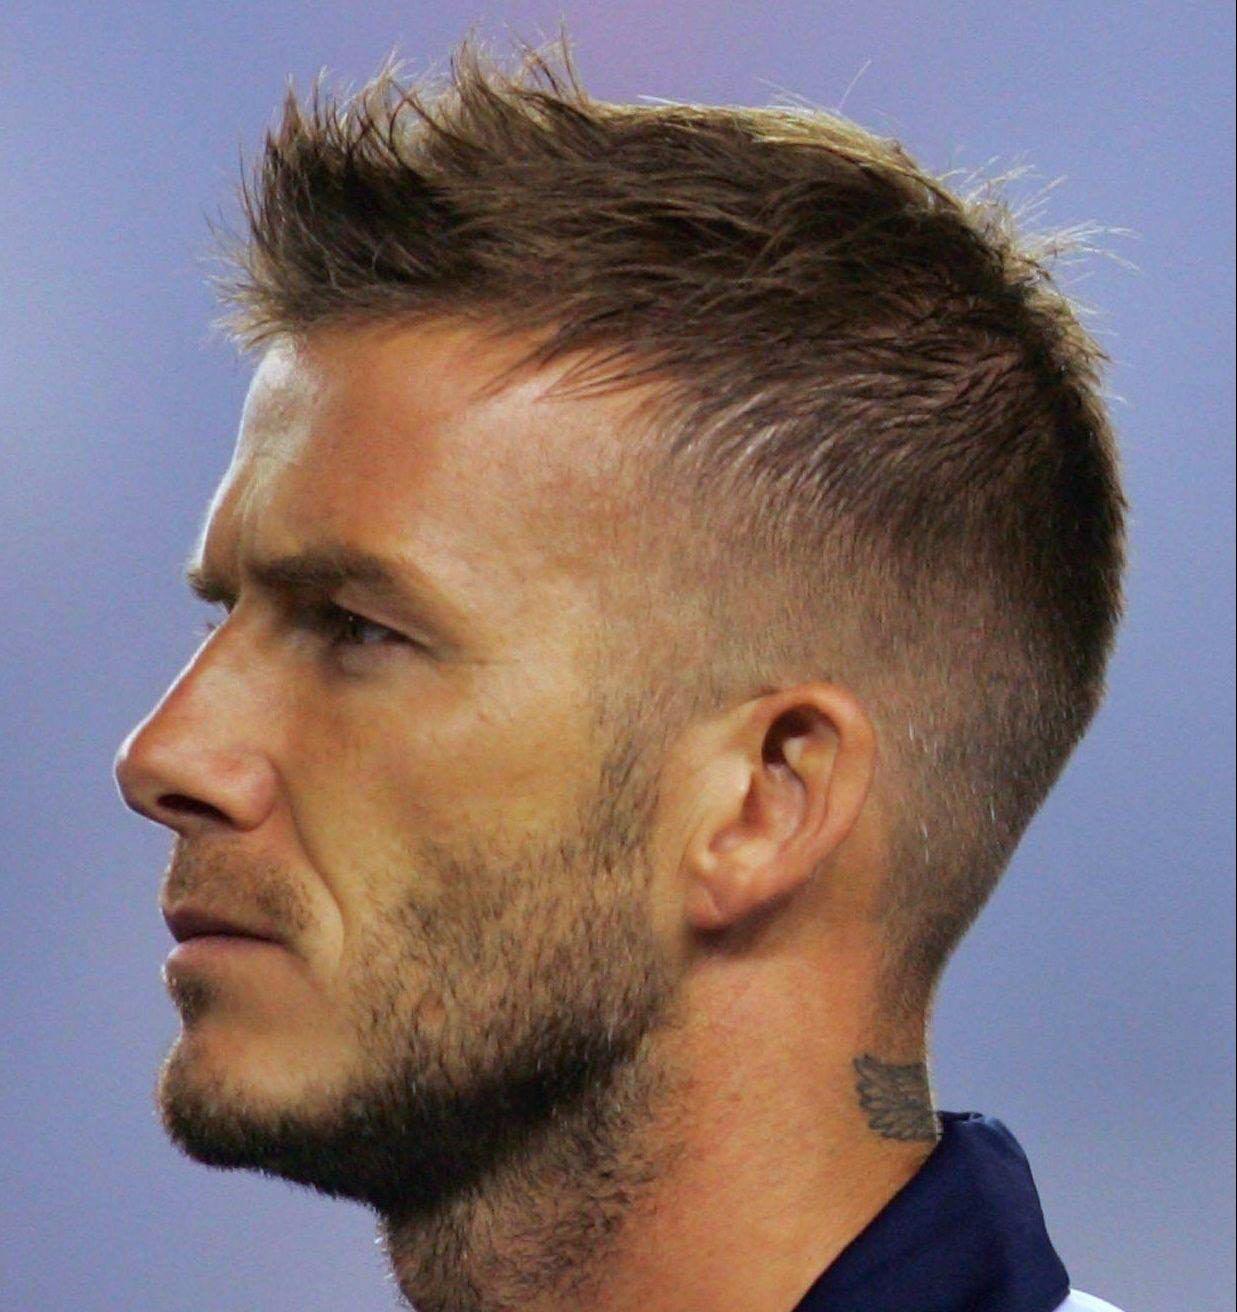 10 Best Hairstyles For Balding Men Thin Hair Men Haircuts For Balding Men Older Mens Hairstyles